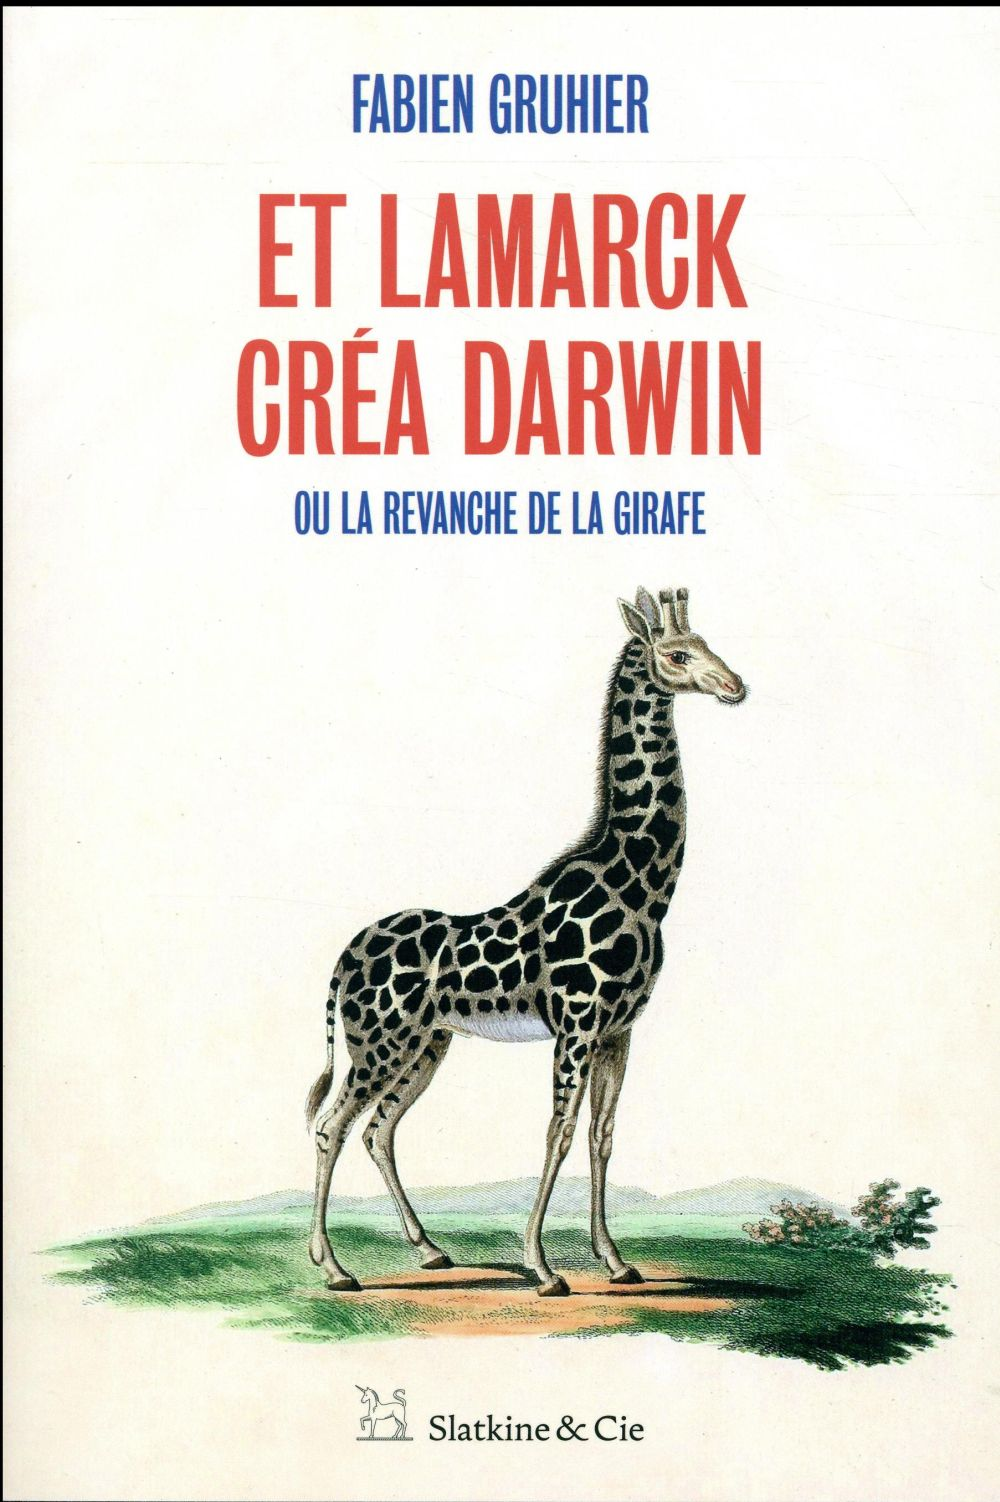 ET LAMARCK CREA DARWIN - OU LA REVANCHE DE LA GIRAFE